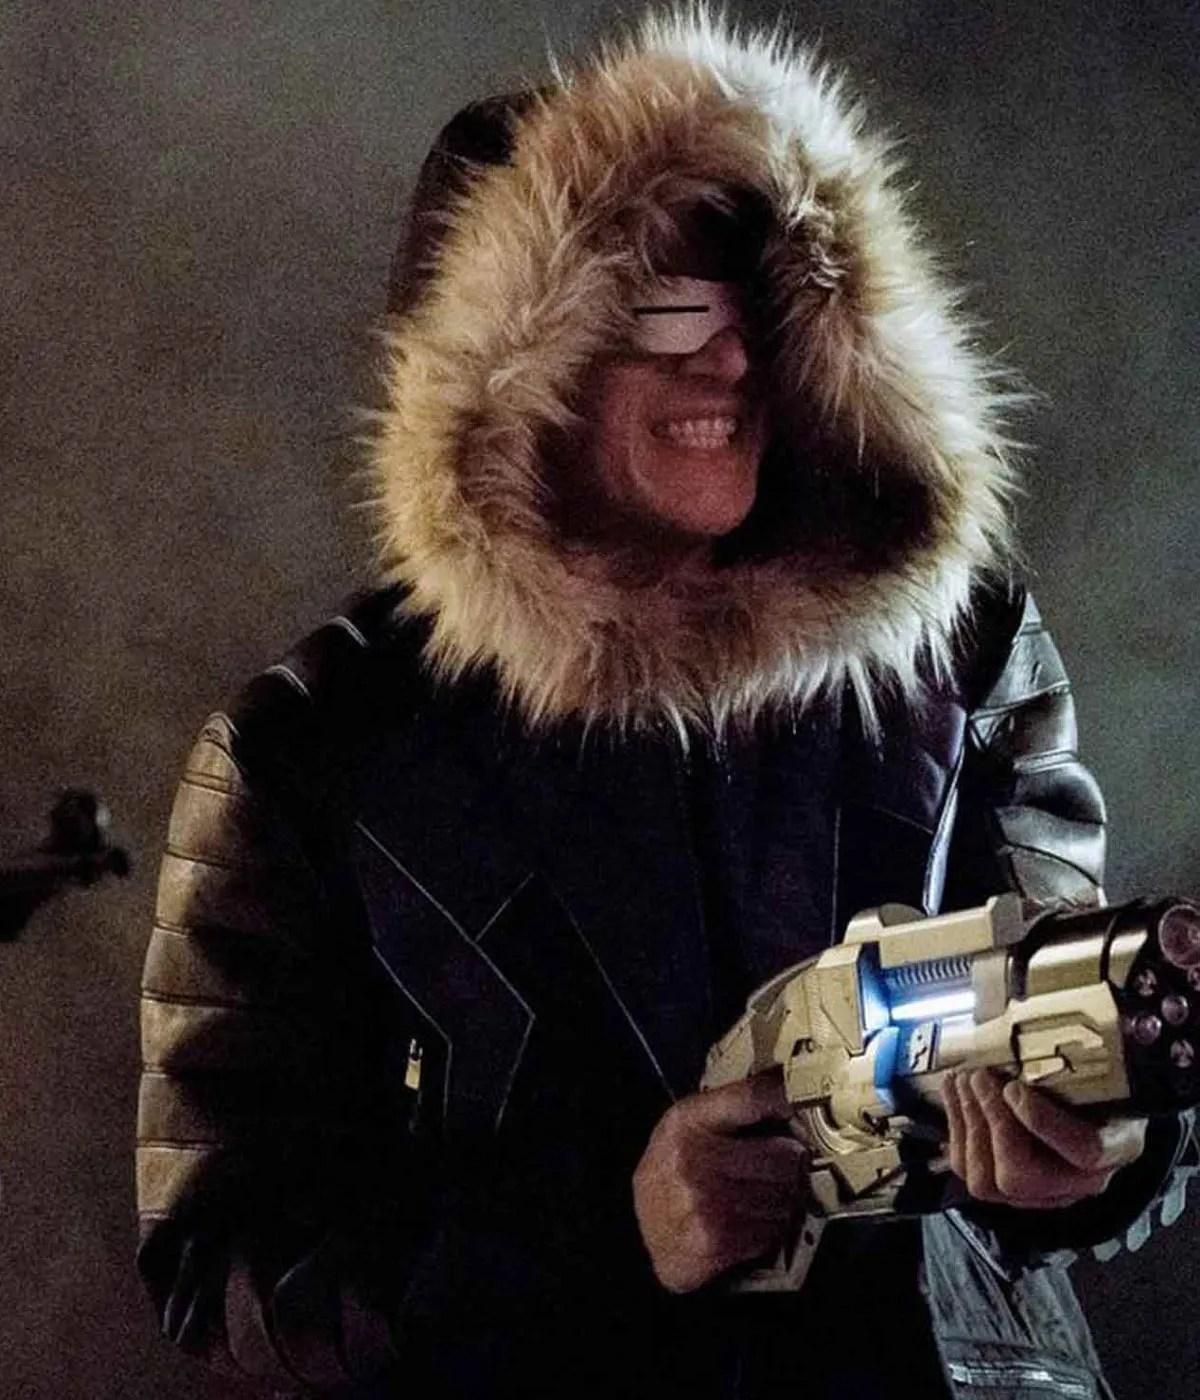 captain-cold-earth-x-citizen-parka-hood